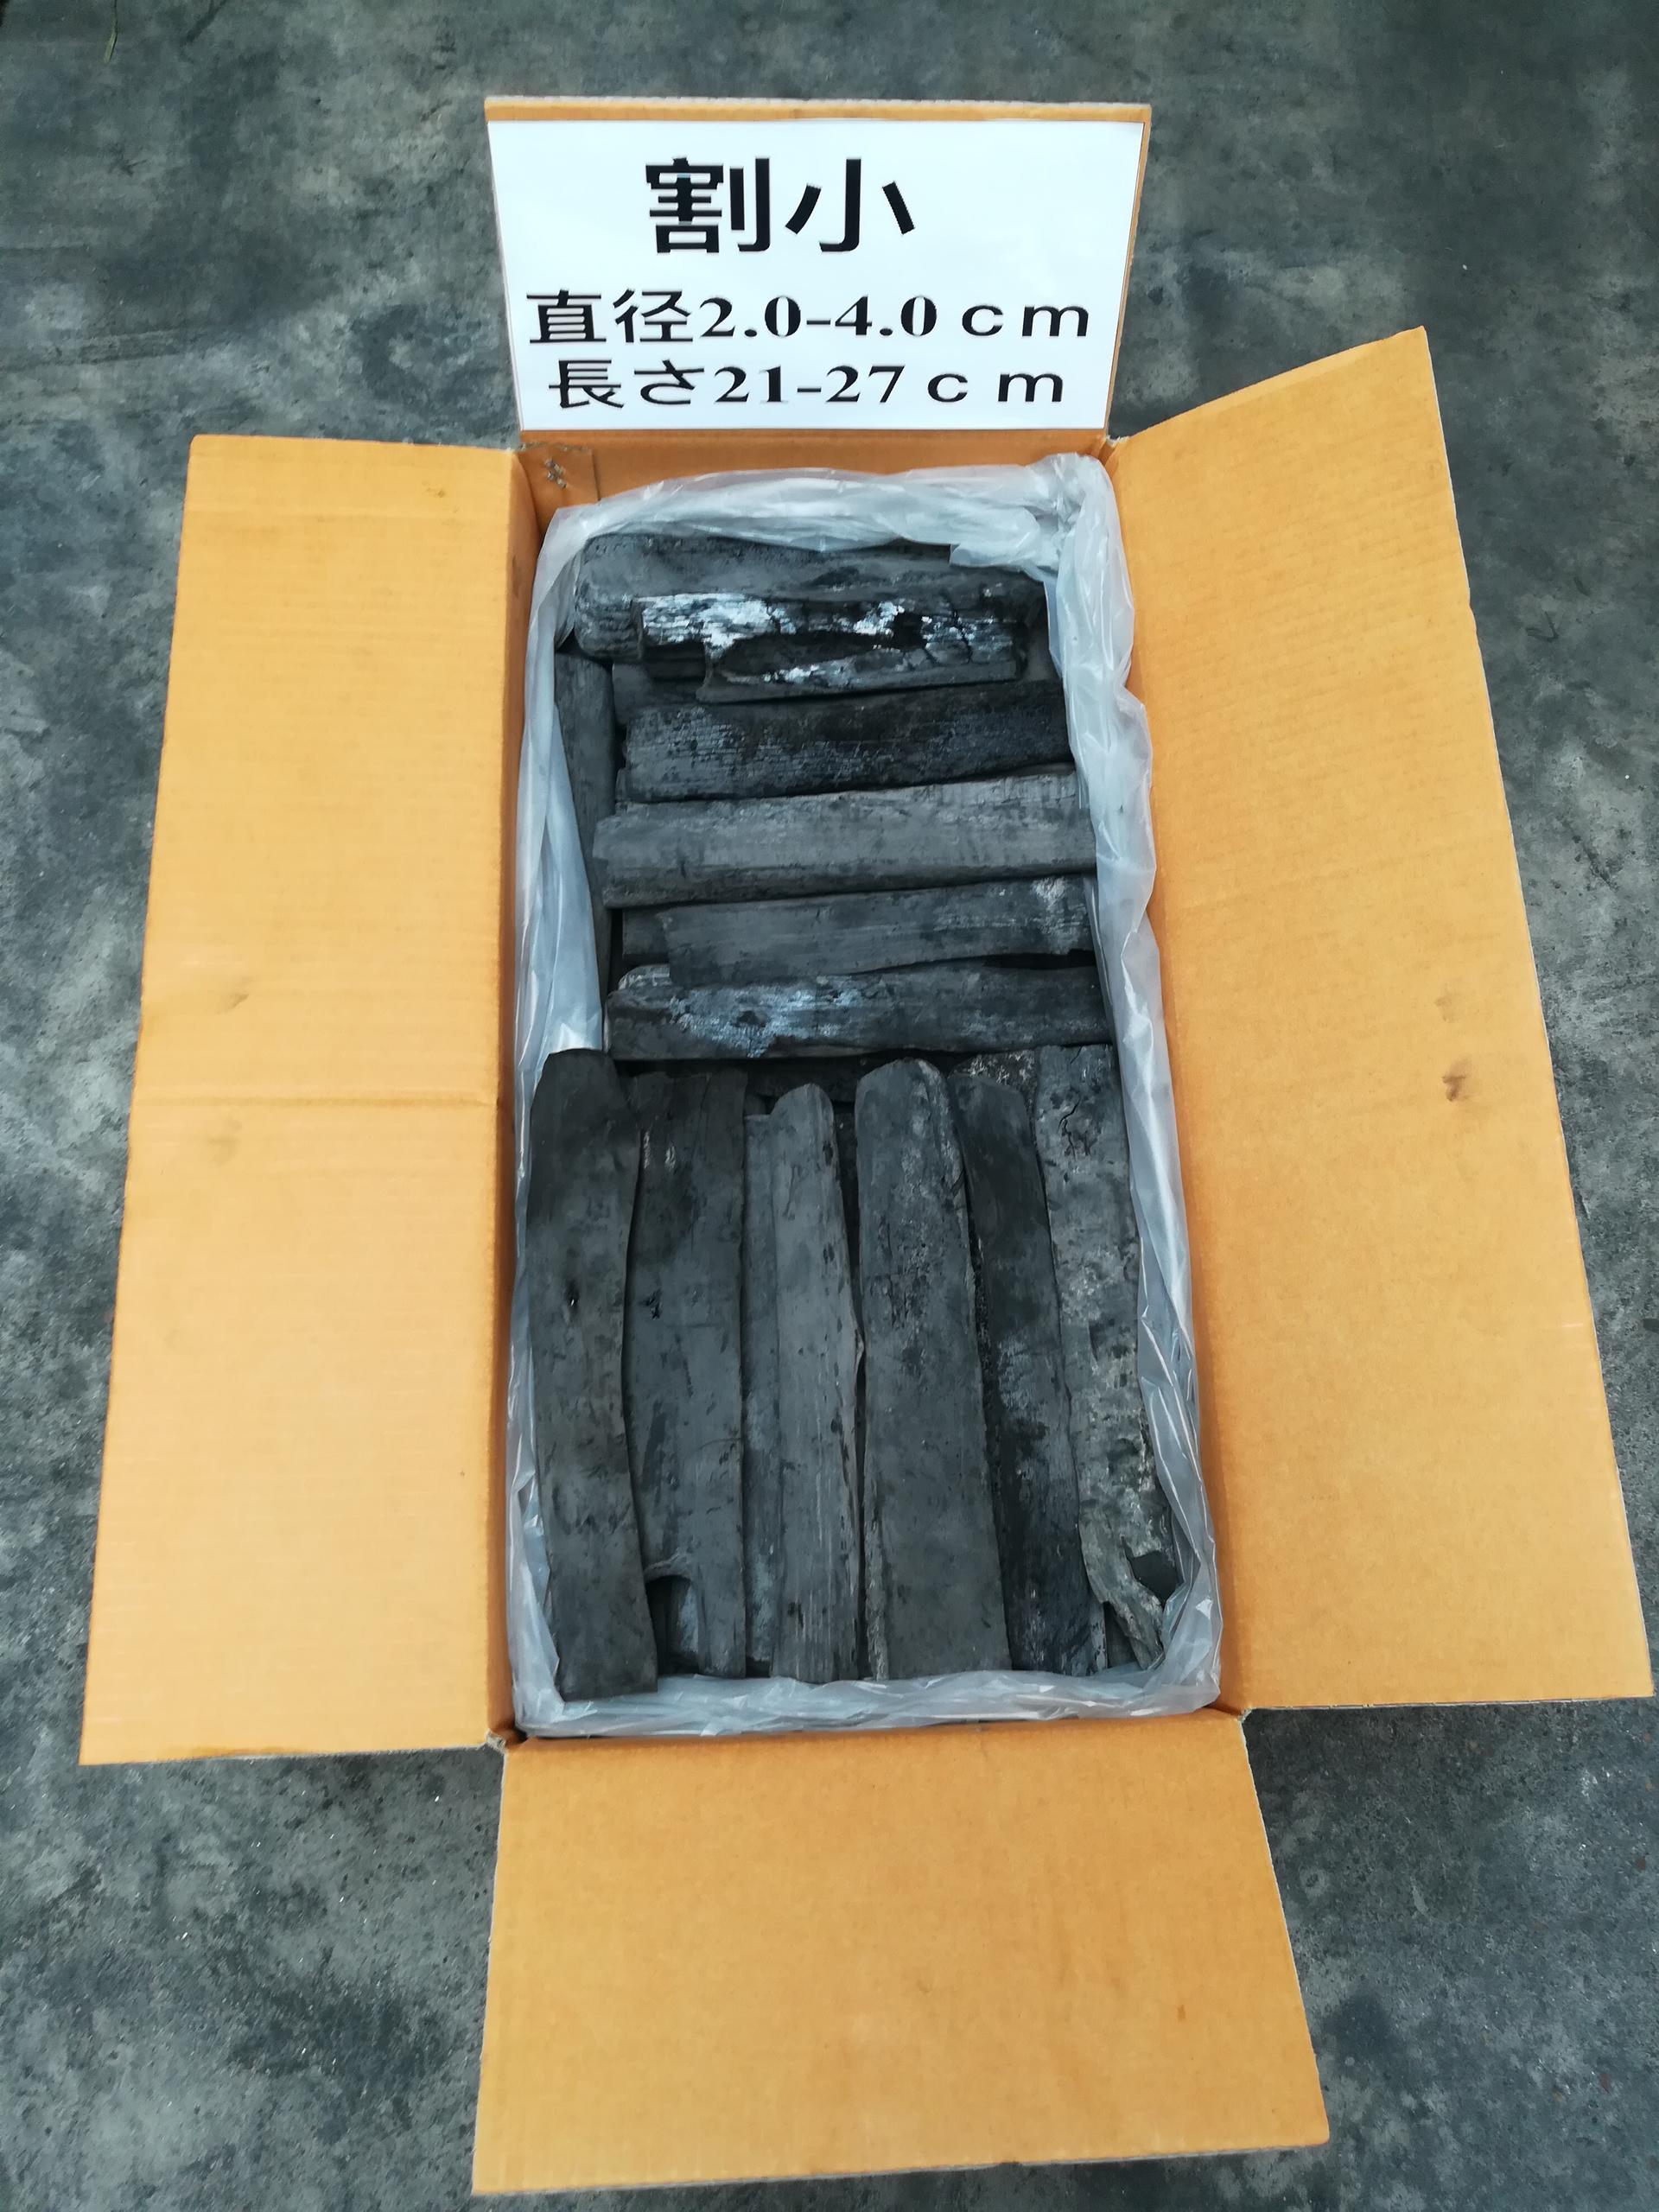 White Binchotan Barbecue Nature Wood Charcoal made in Laos